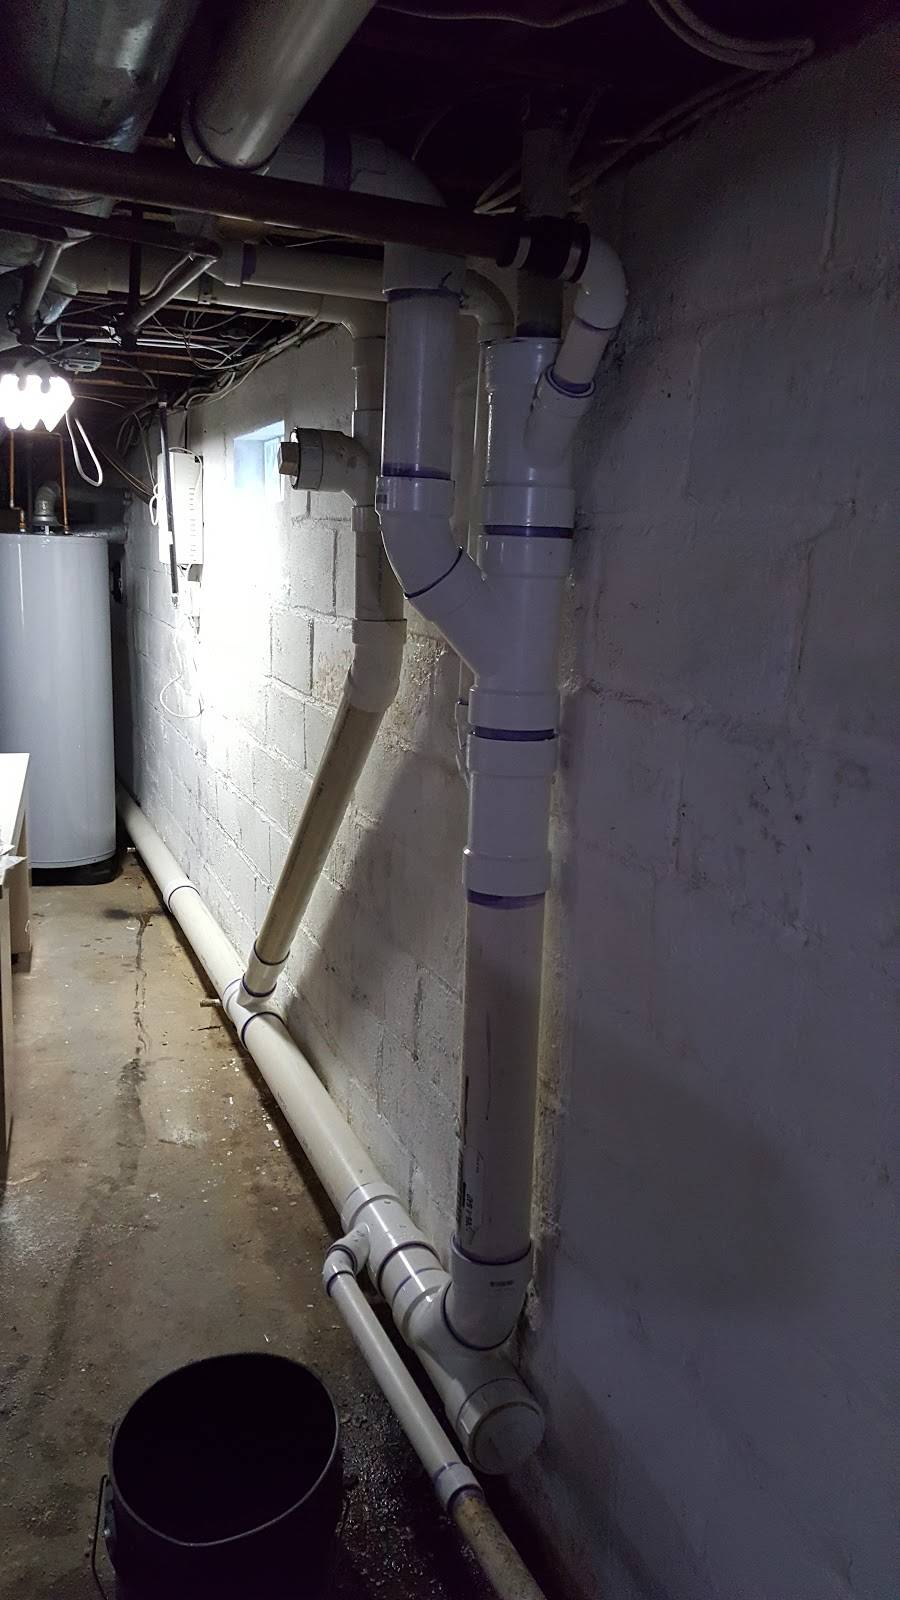 FKRIV Plumbing & Heating, Inc. - plumber  | Photo 4 of 4 | Address: 3109 Brightside Ave, Bristol, PA 19007, USA | Phone: (888) 711-5882